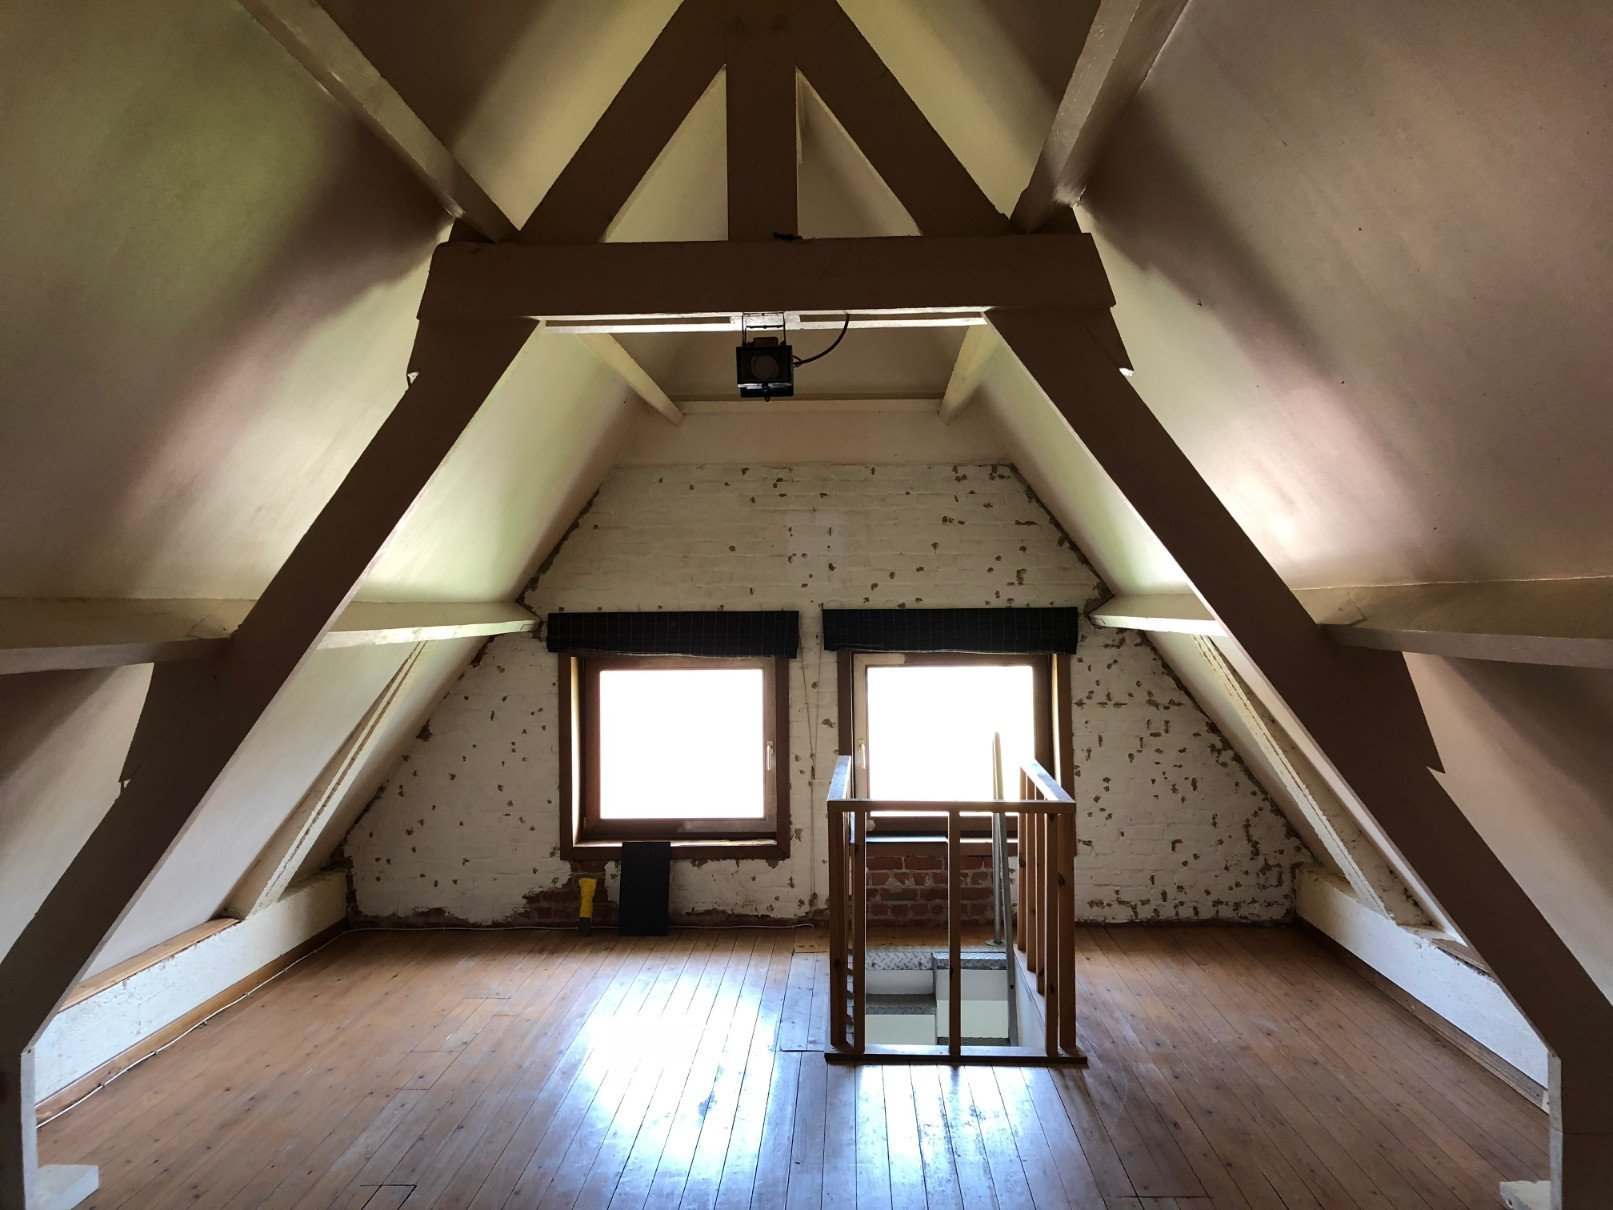 Rietveldprojects-Villa Were Di - Te Koop : Te Huur (per week)17.jpg